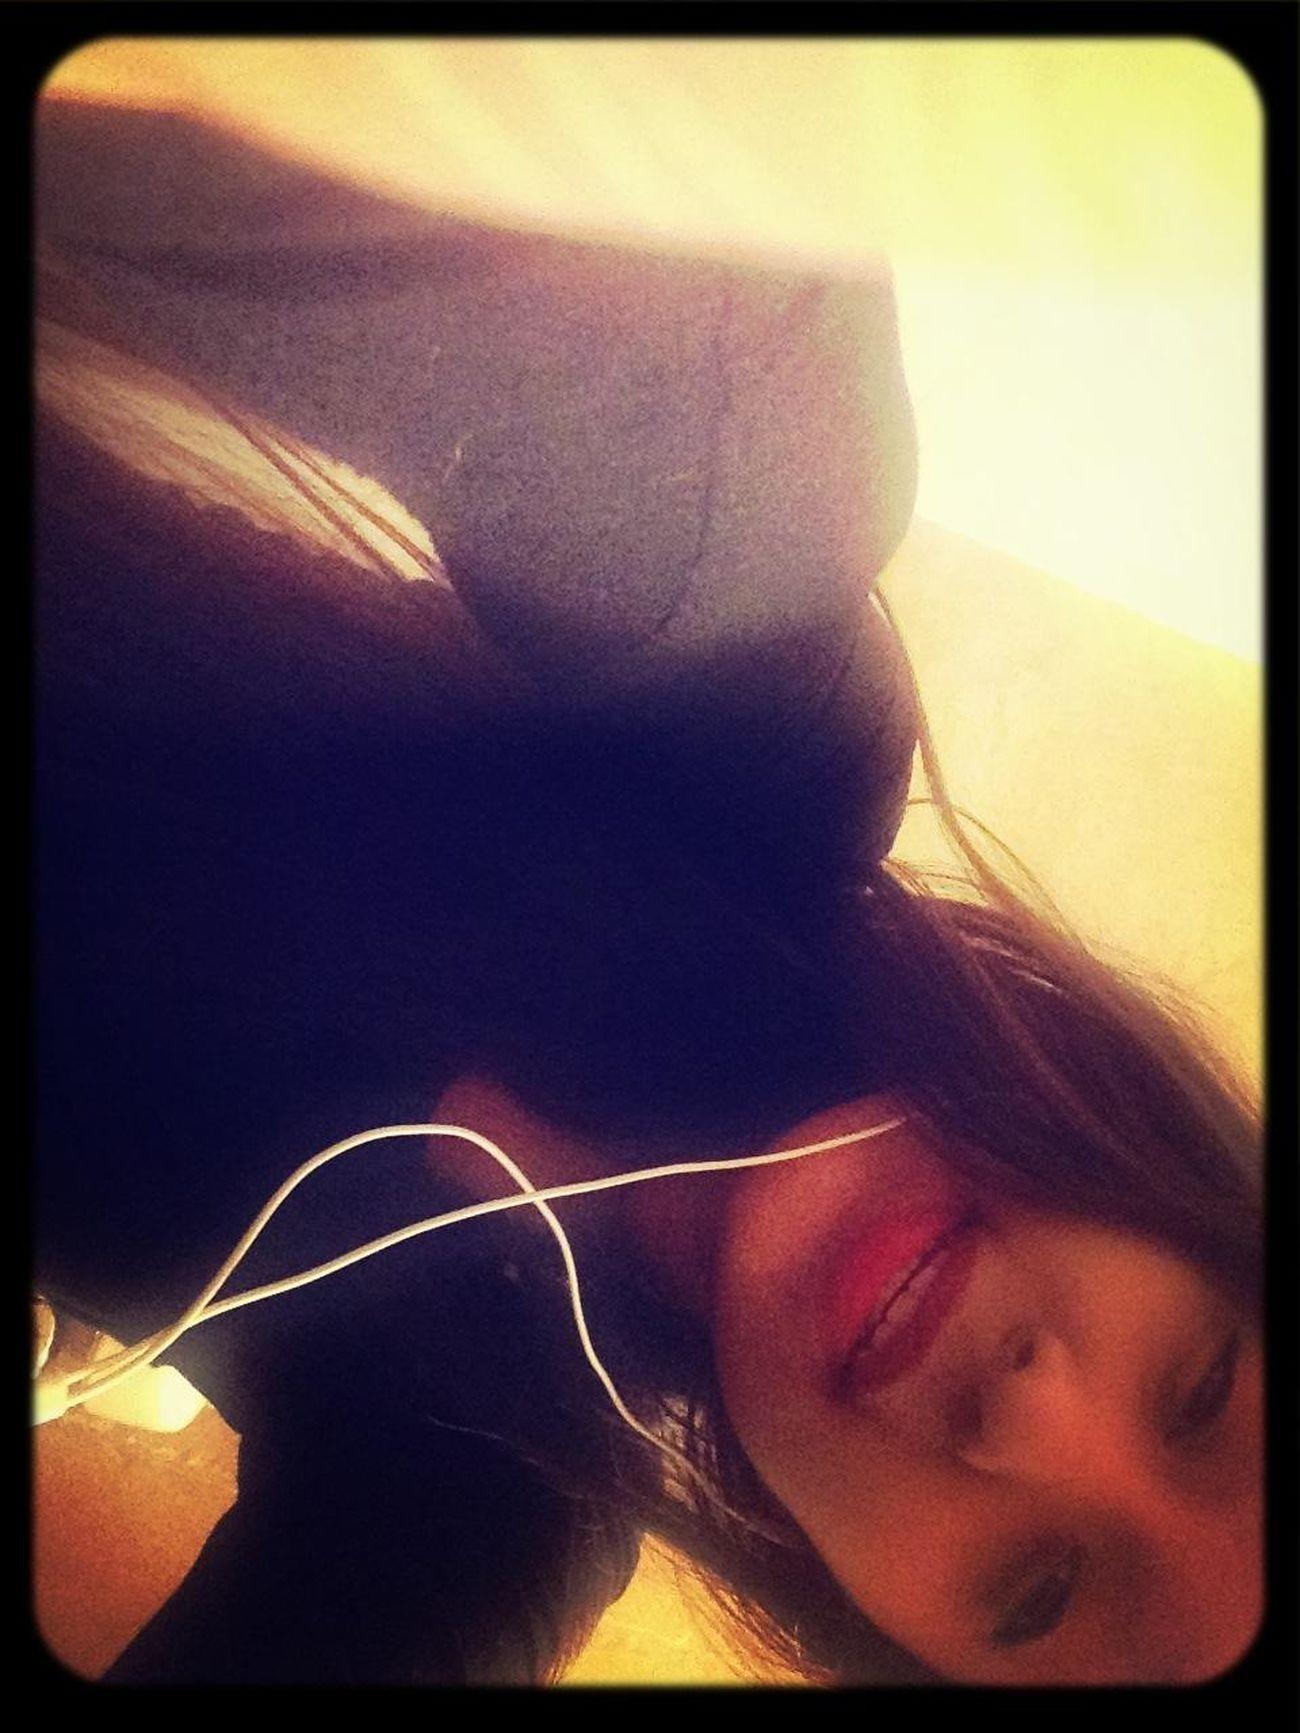 Itss Whateverrr (;